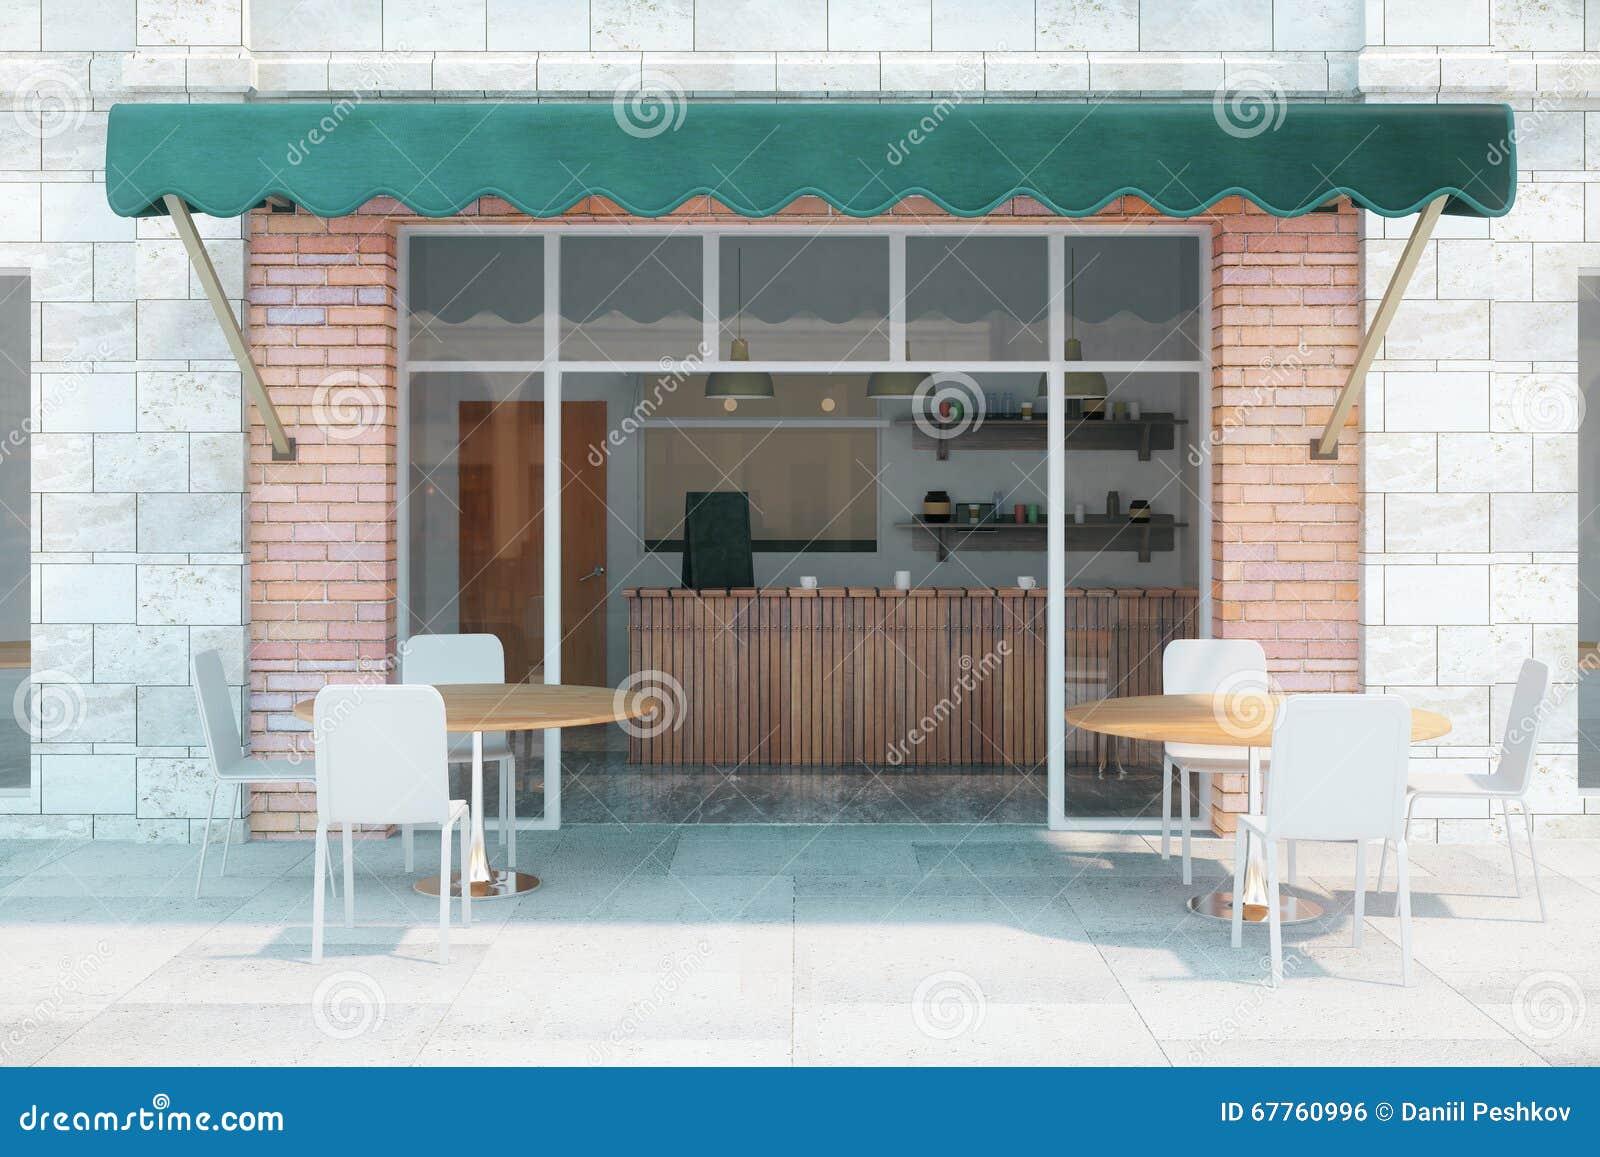 Cafe exterior front stock illustration  Illustration of